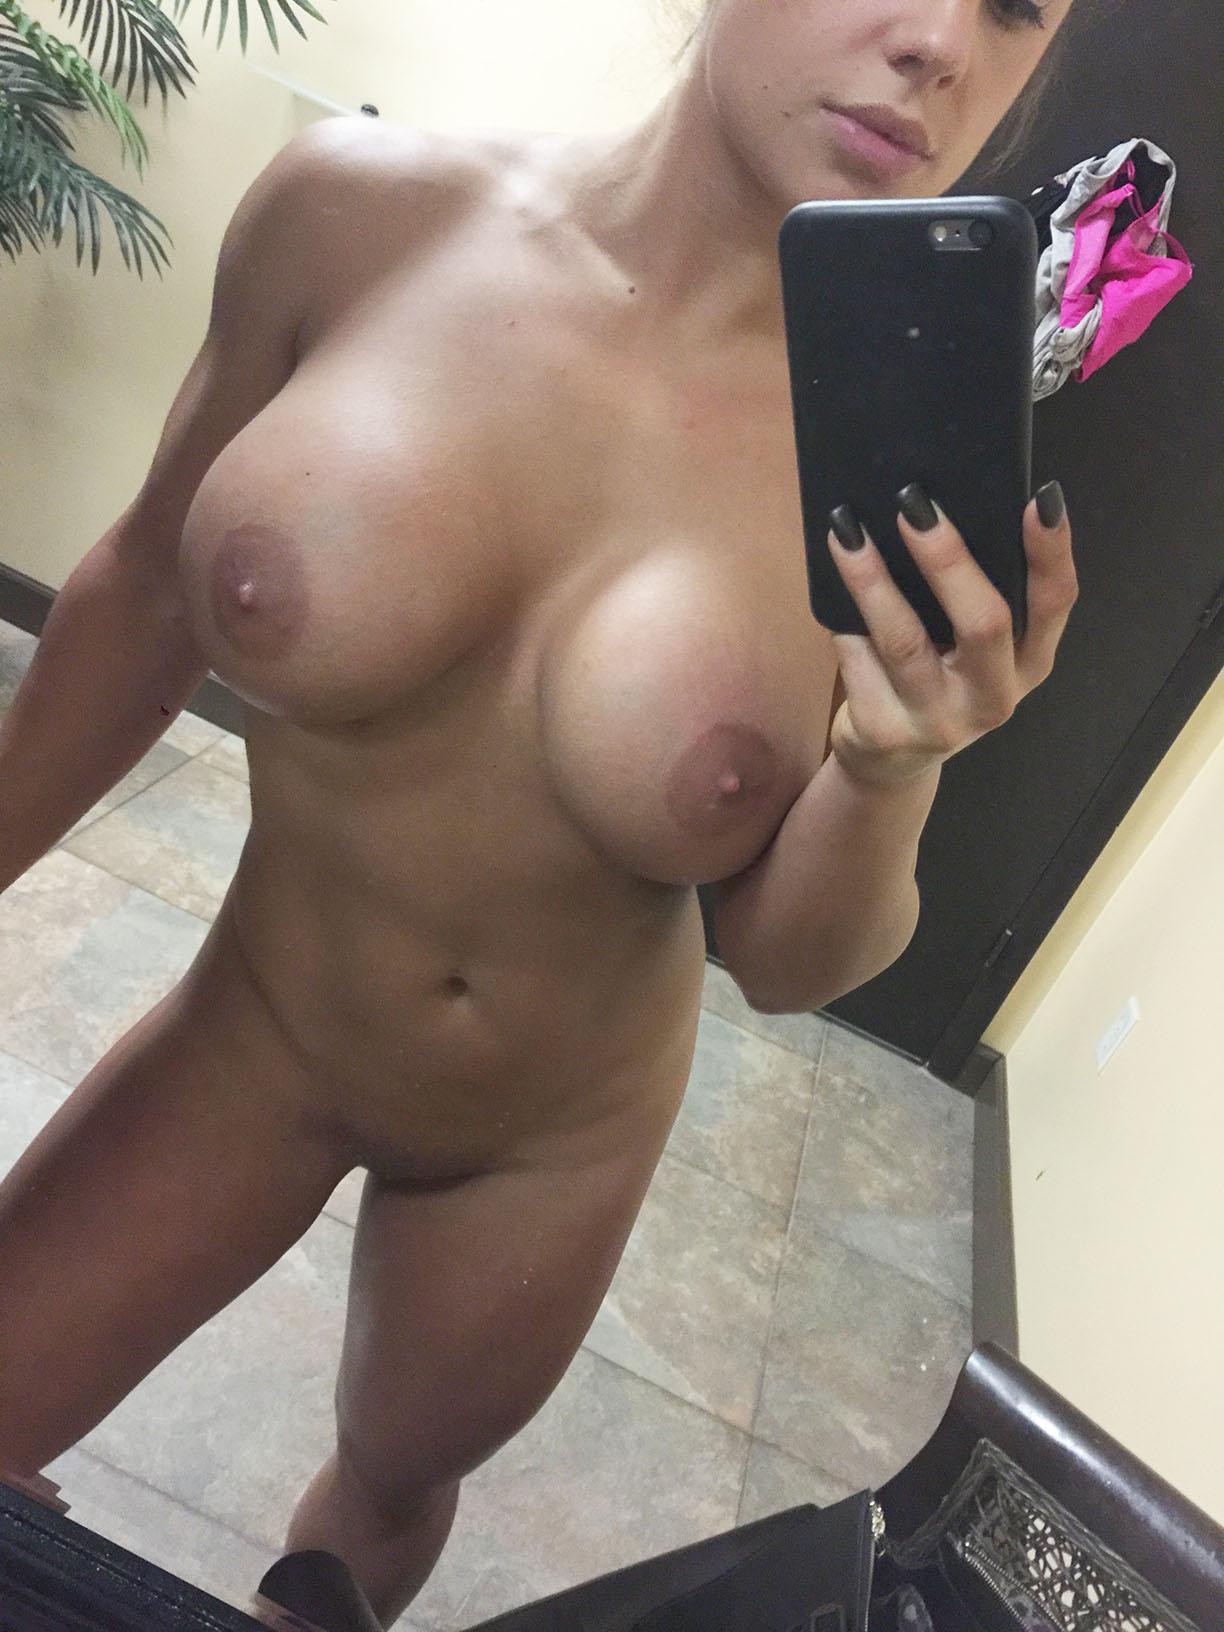 Celeste Bonin Nudes Leaked, Boobs and Body